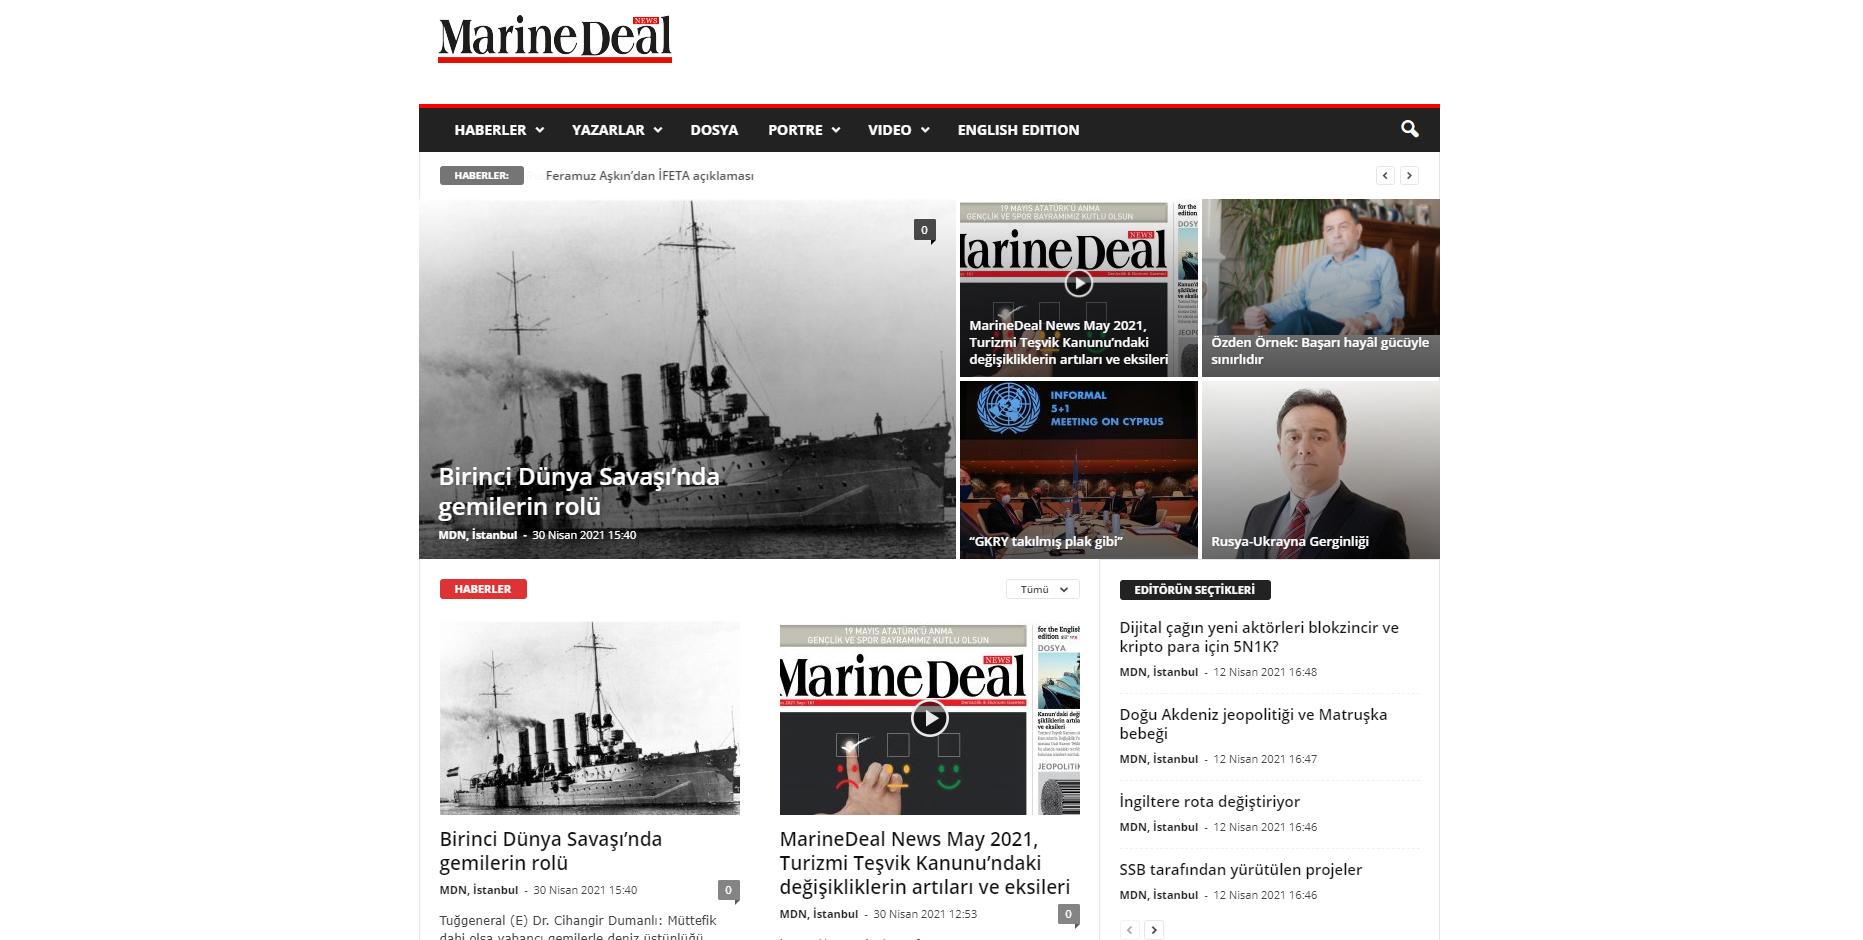 MarineDeal News